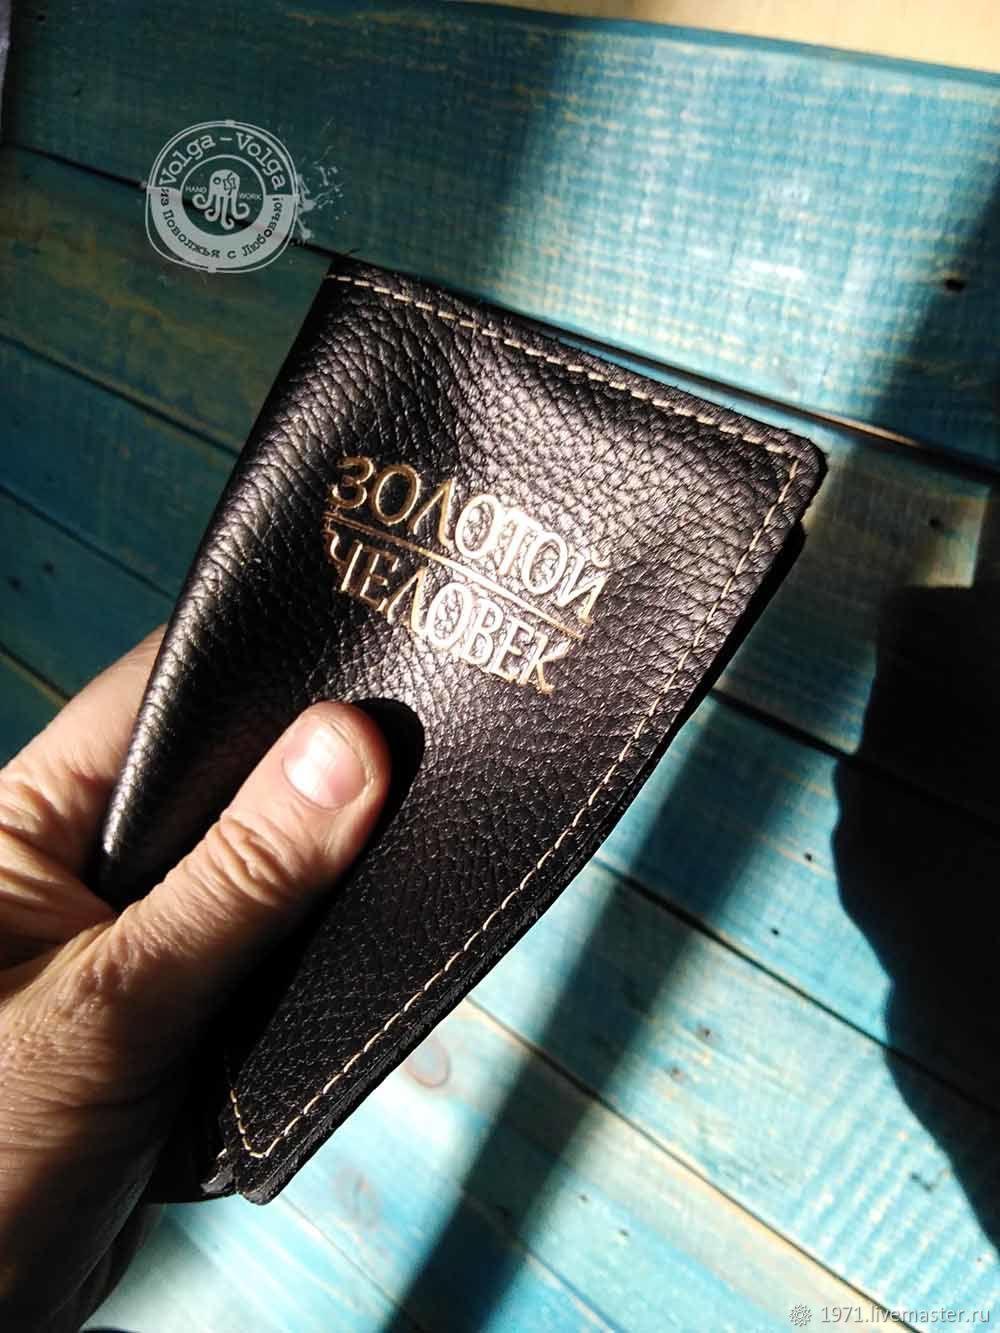 passport cover - the GOLDEN MAN, Passport cover, Tolyatti,  Фото №1